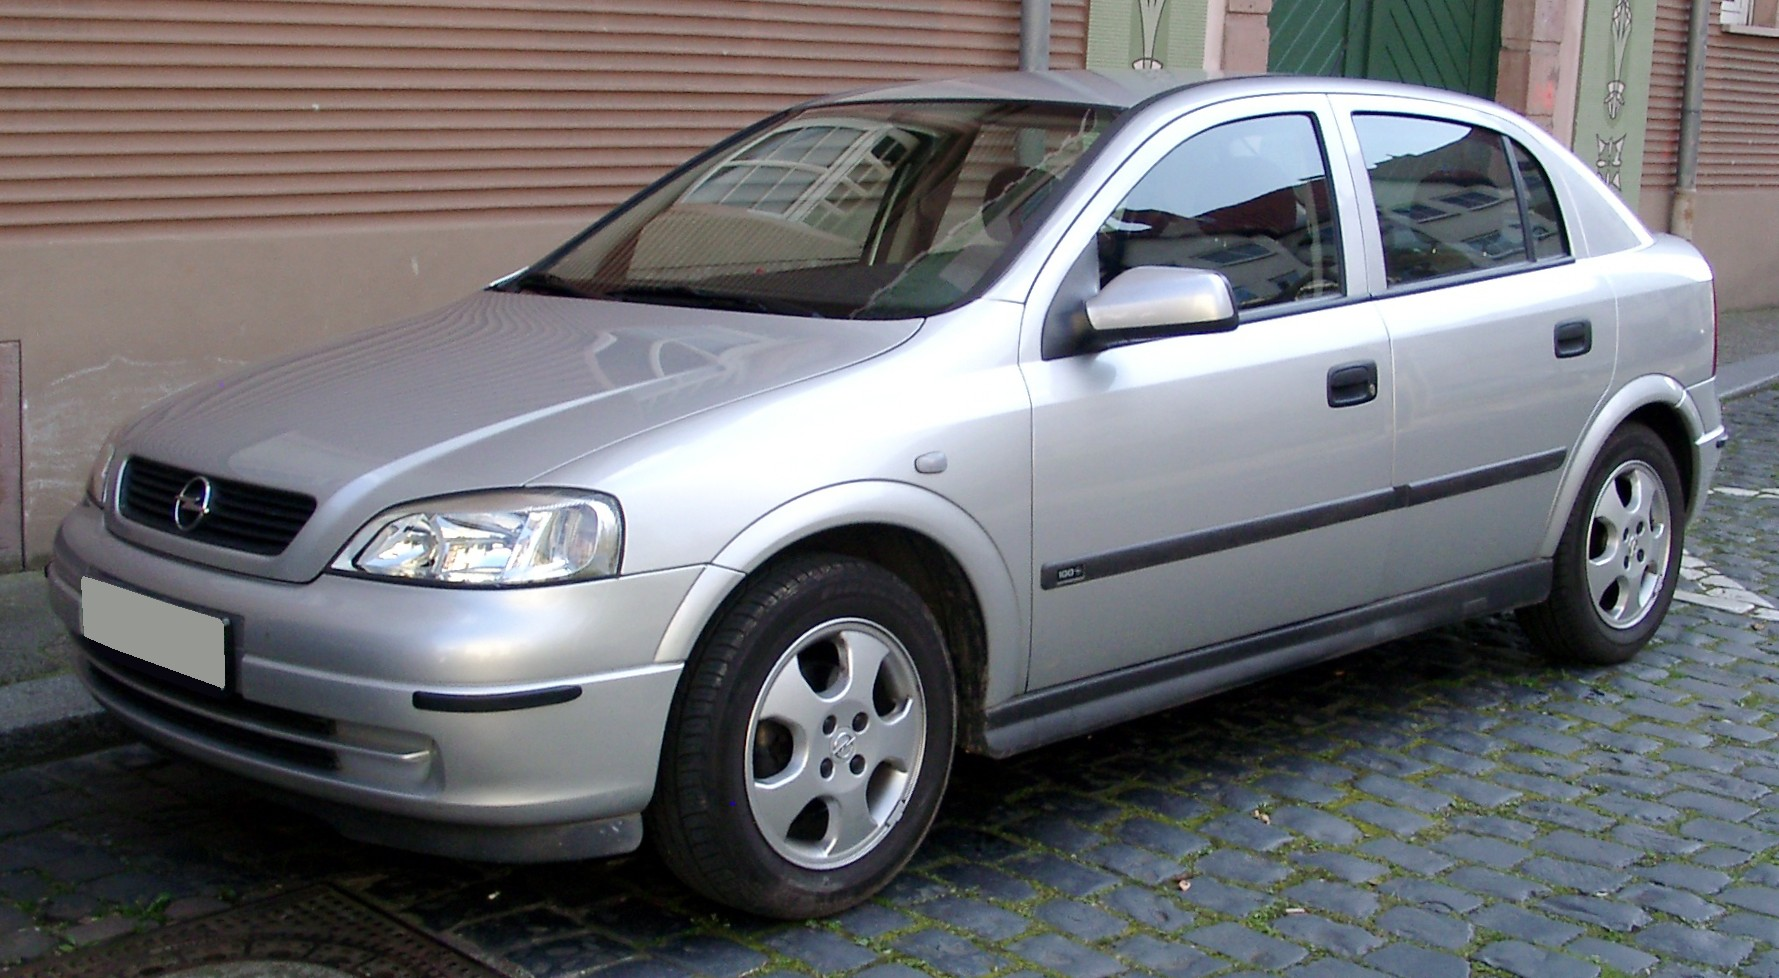 Opel astra g uluda s zl k for Opel astra g interieurfilter